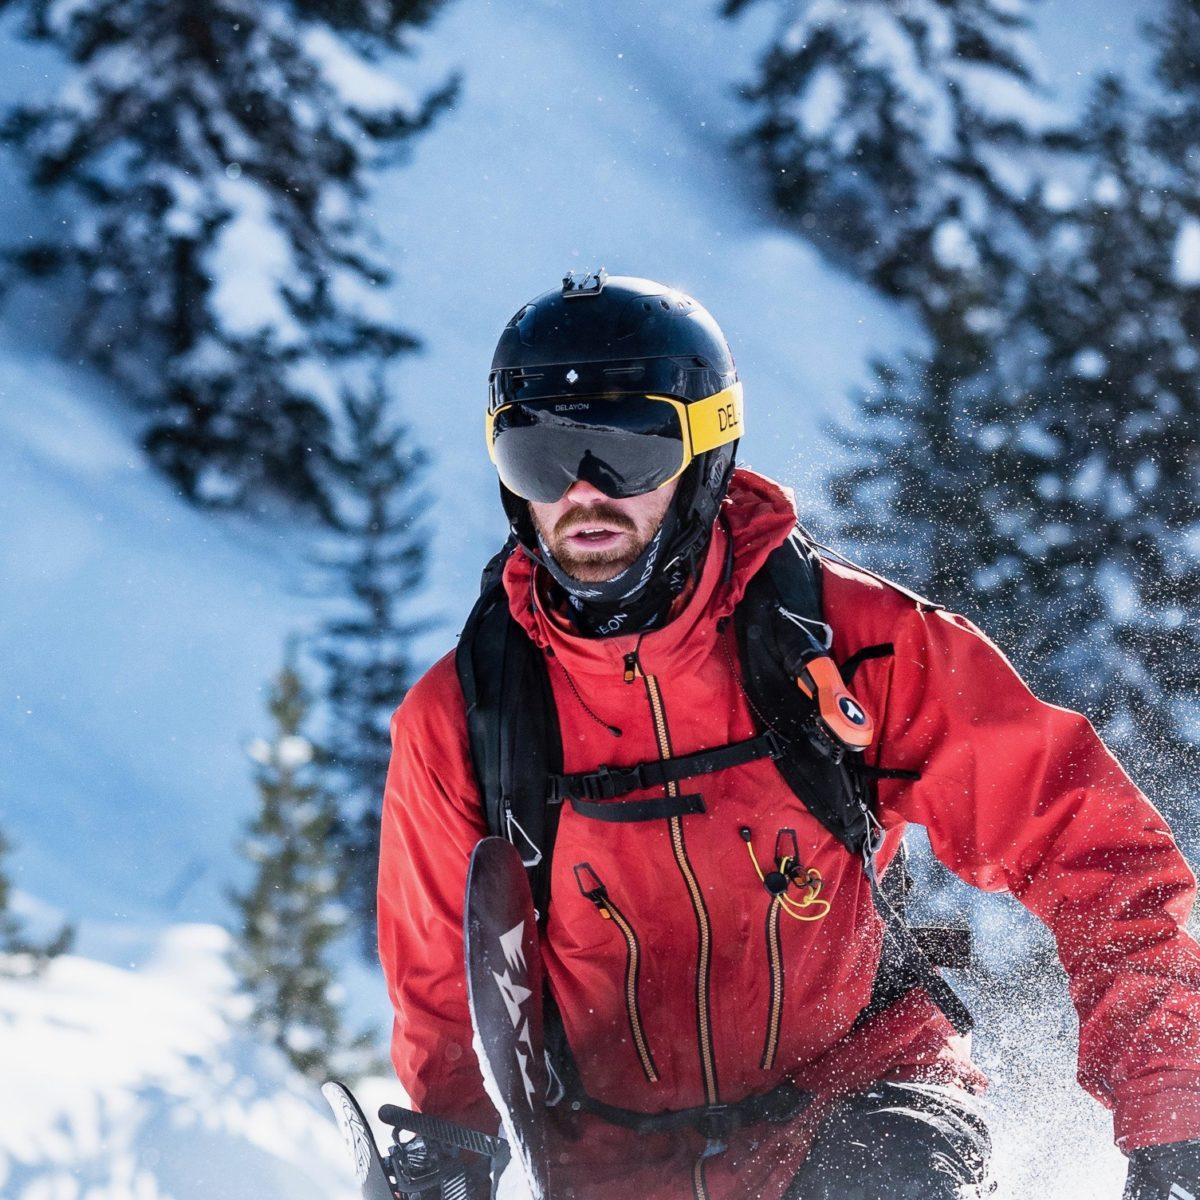 DELAYON Eyewear Explorer Goggle Hornet Yellow Nicolas Metz Chris Riefenberg 2